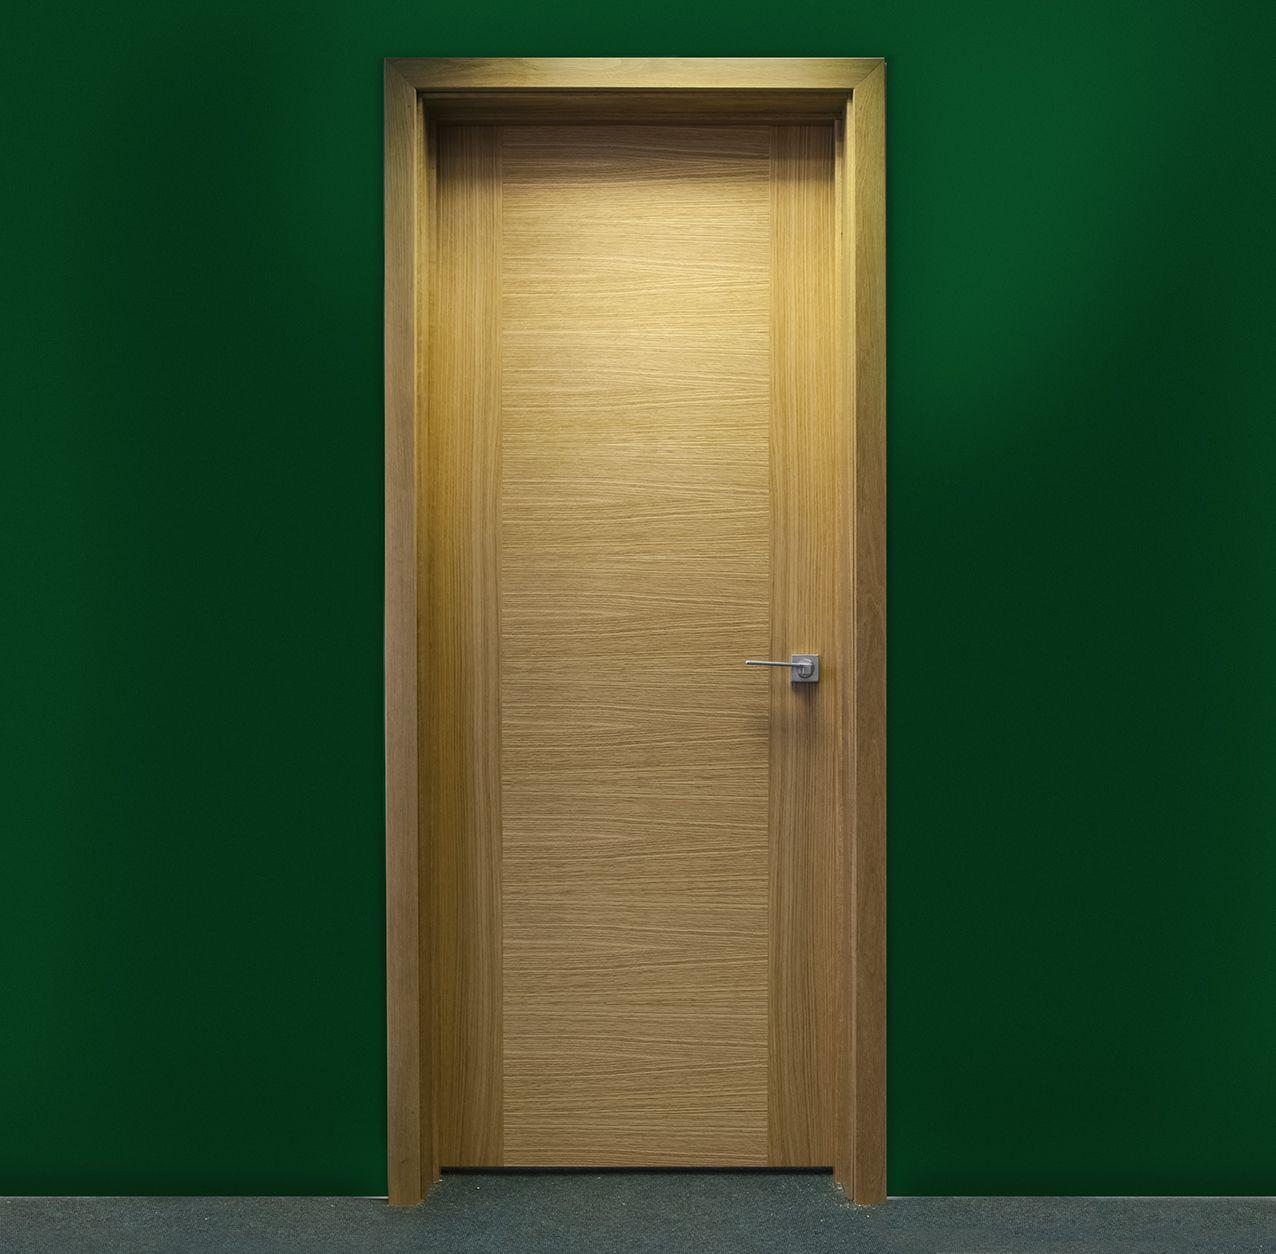 Vicaima Oak 2 //.vicaima.com/ & Vicaima Oak 2 http://www.vicaima.com/ | Shut that door... | Pinterest